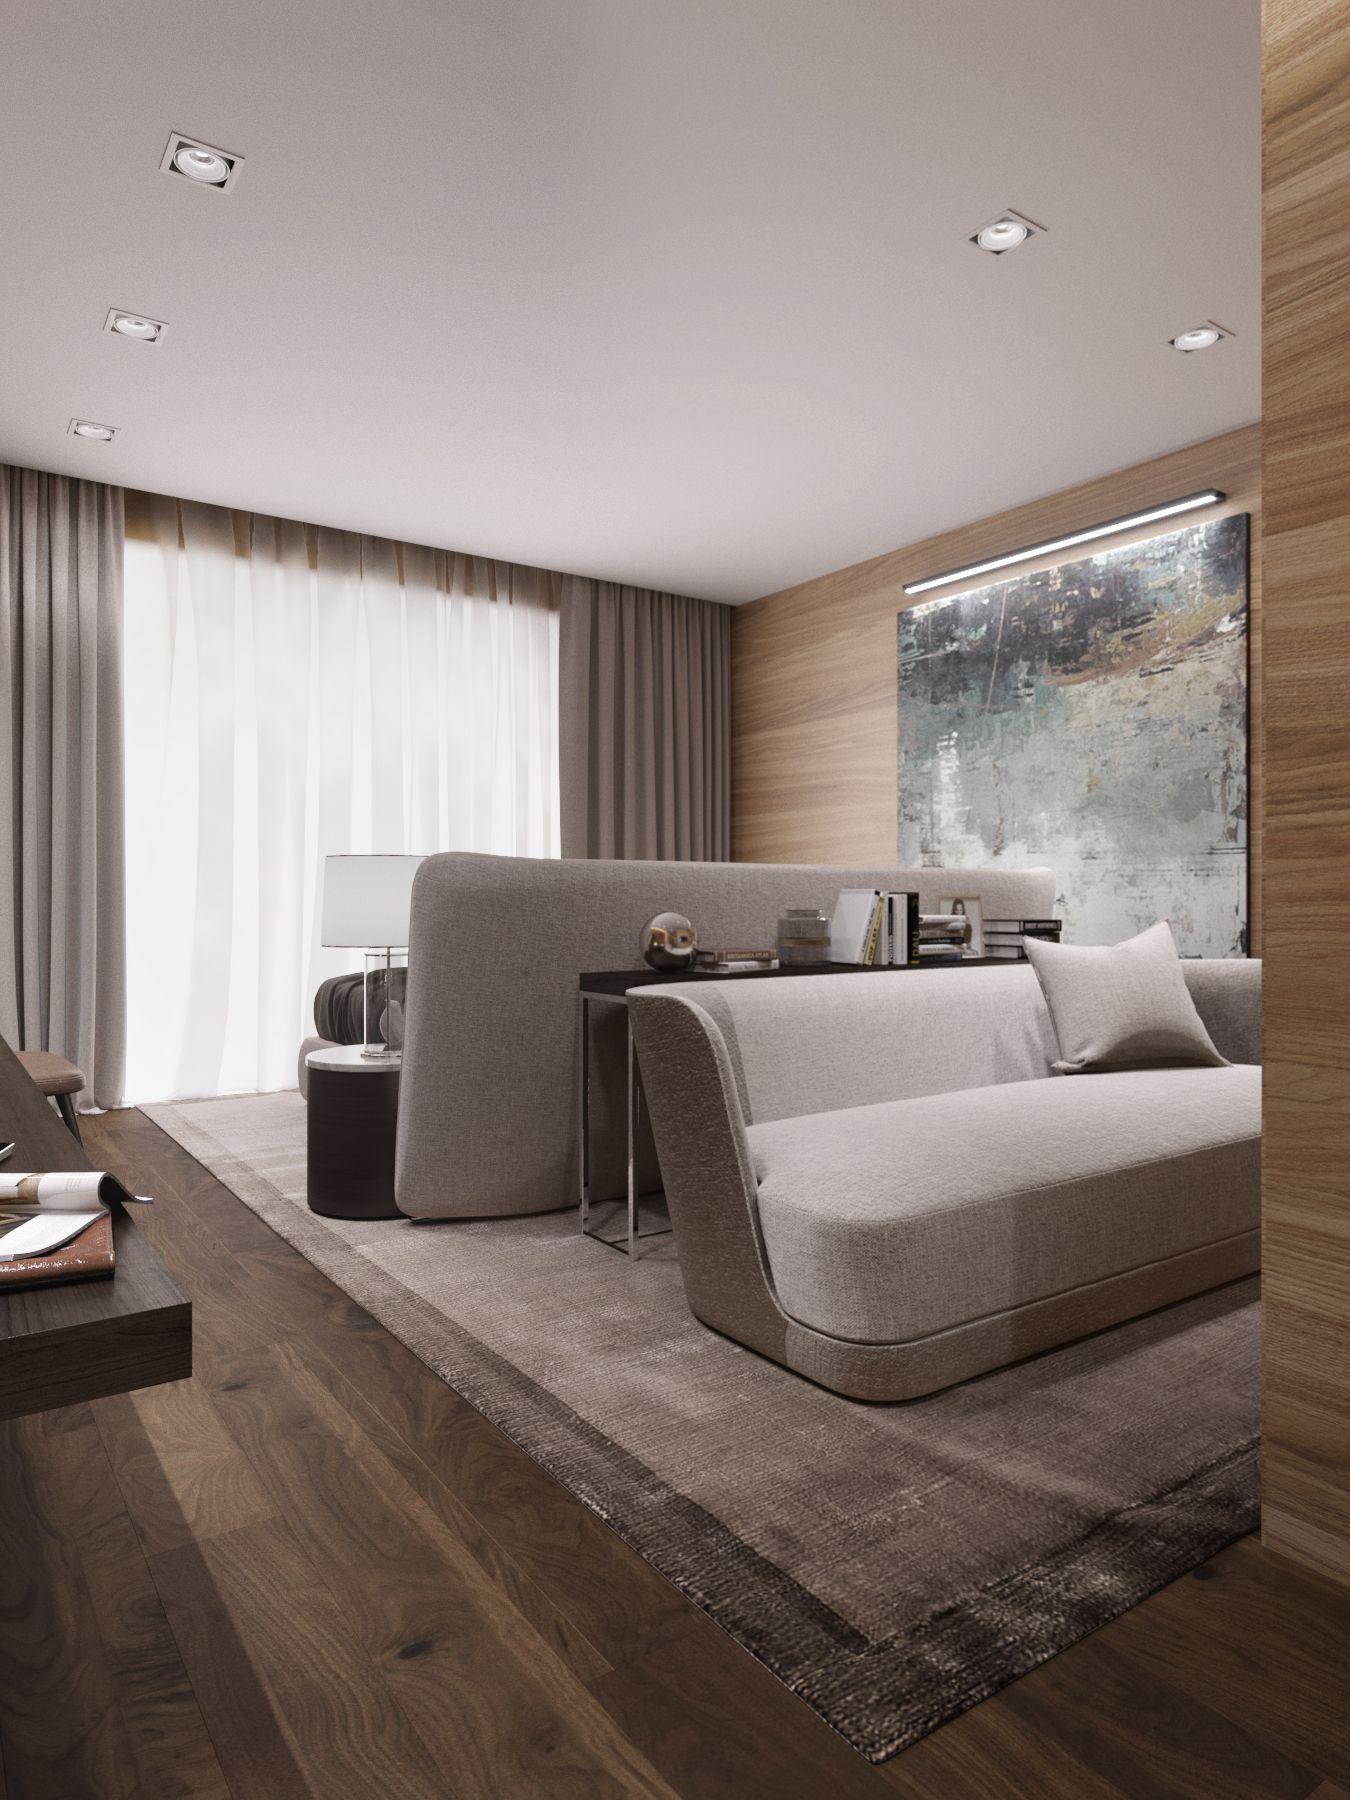 3D rendering of hotel rooms 3D rendering